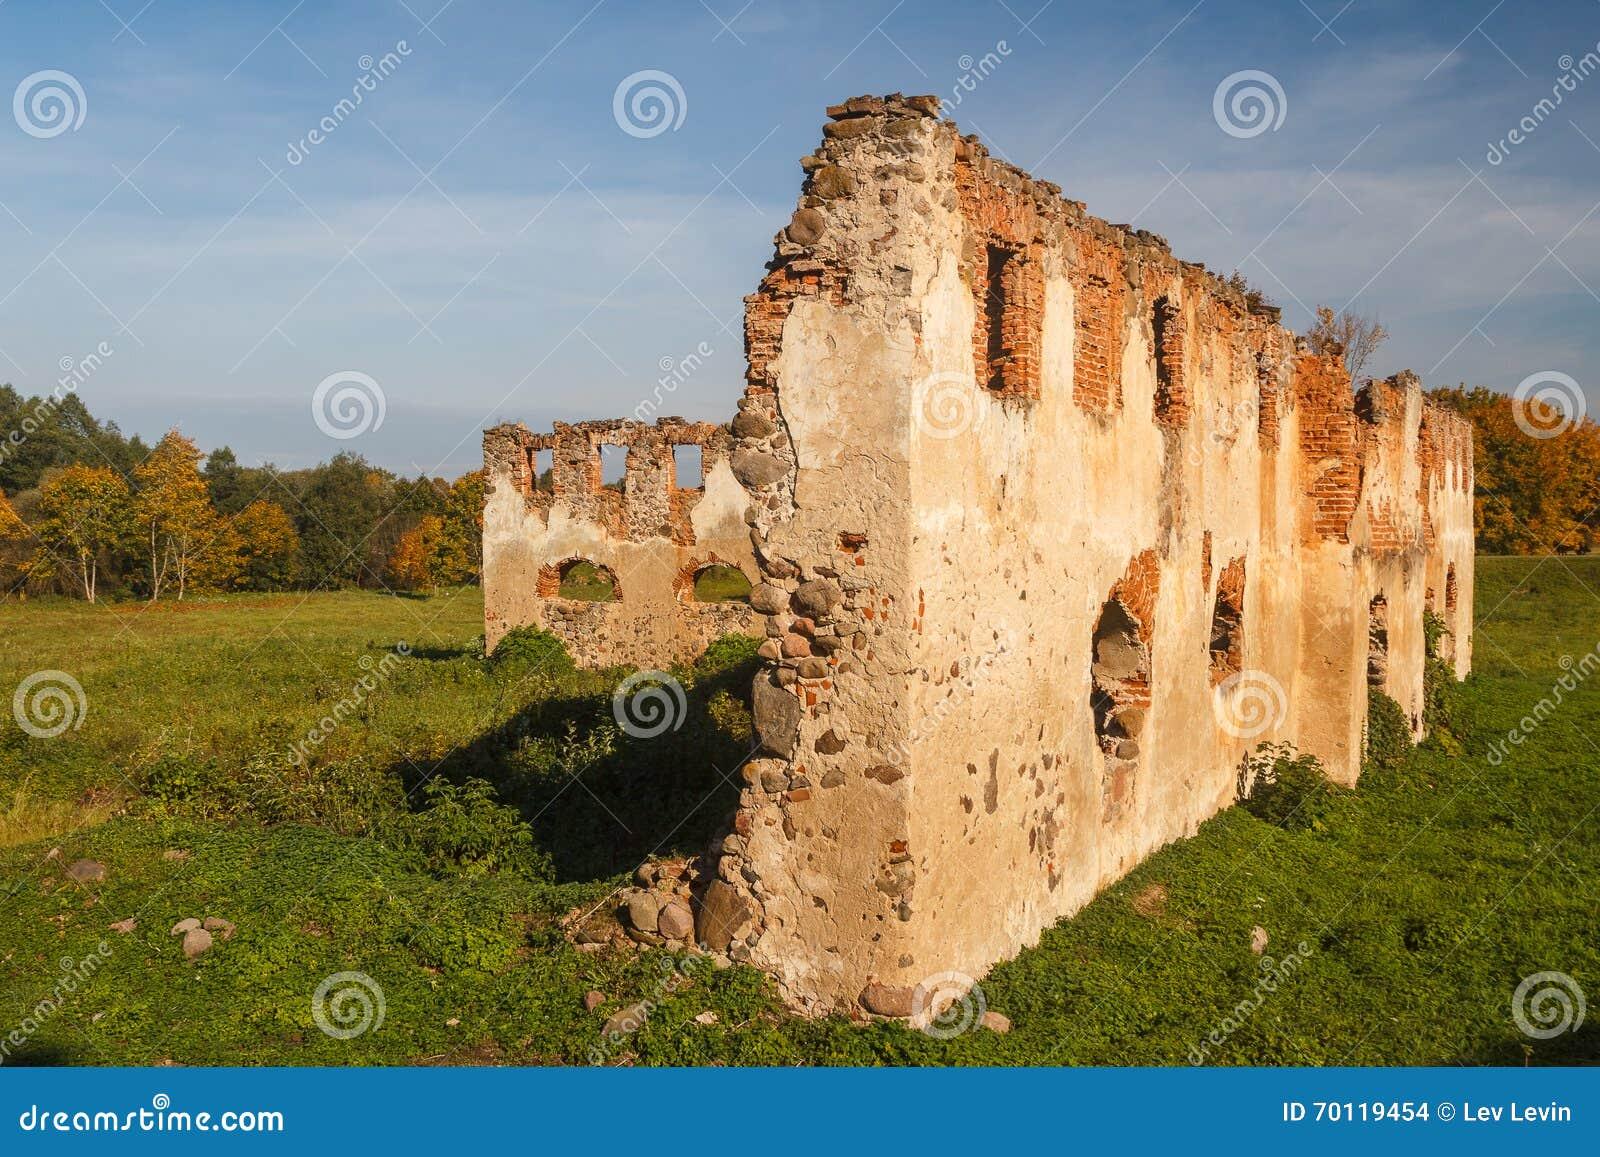 Ruinen des Landsitzes nahe Turgelyay